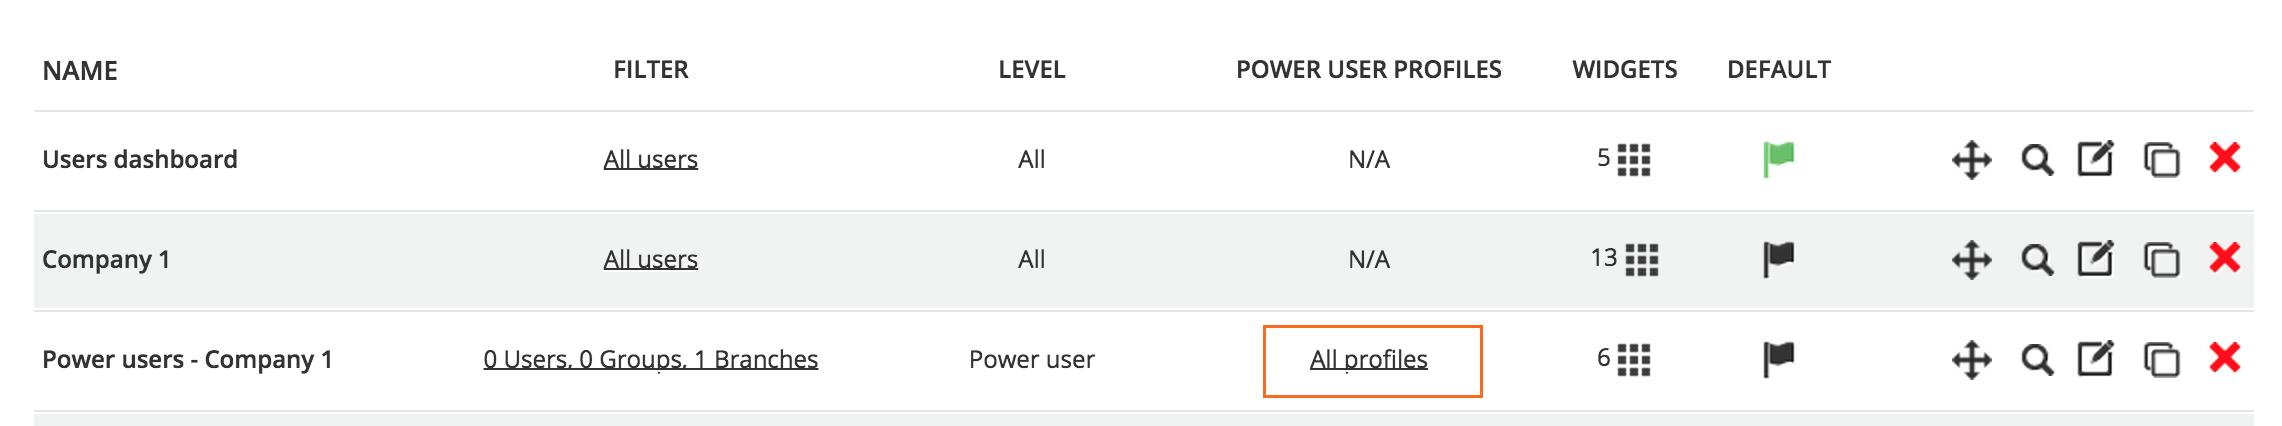 Power user Profiles